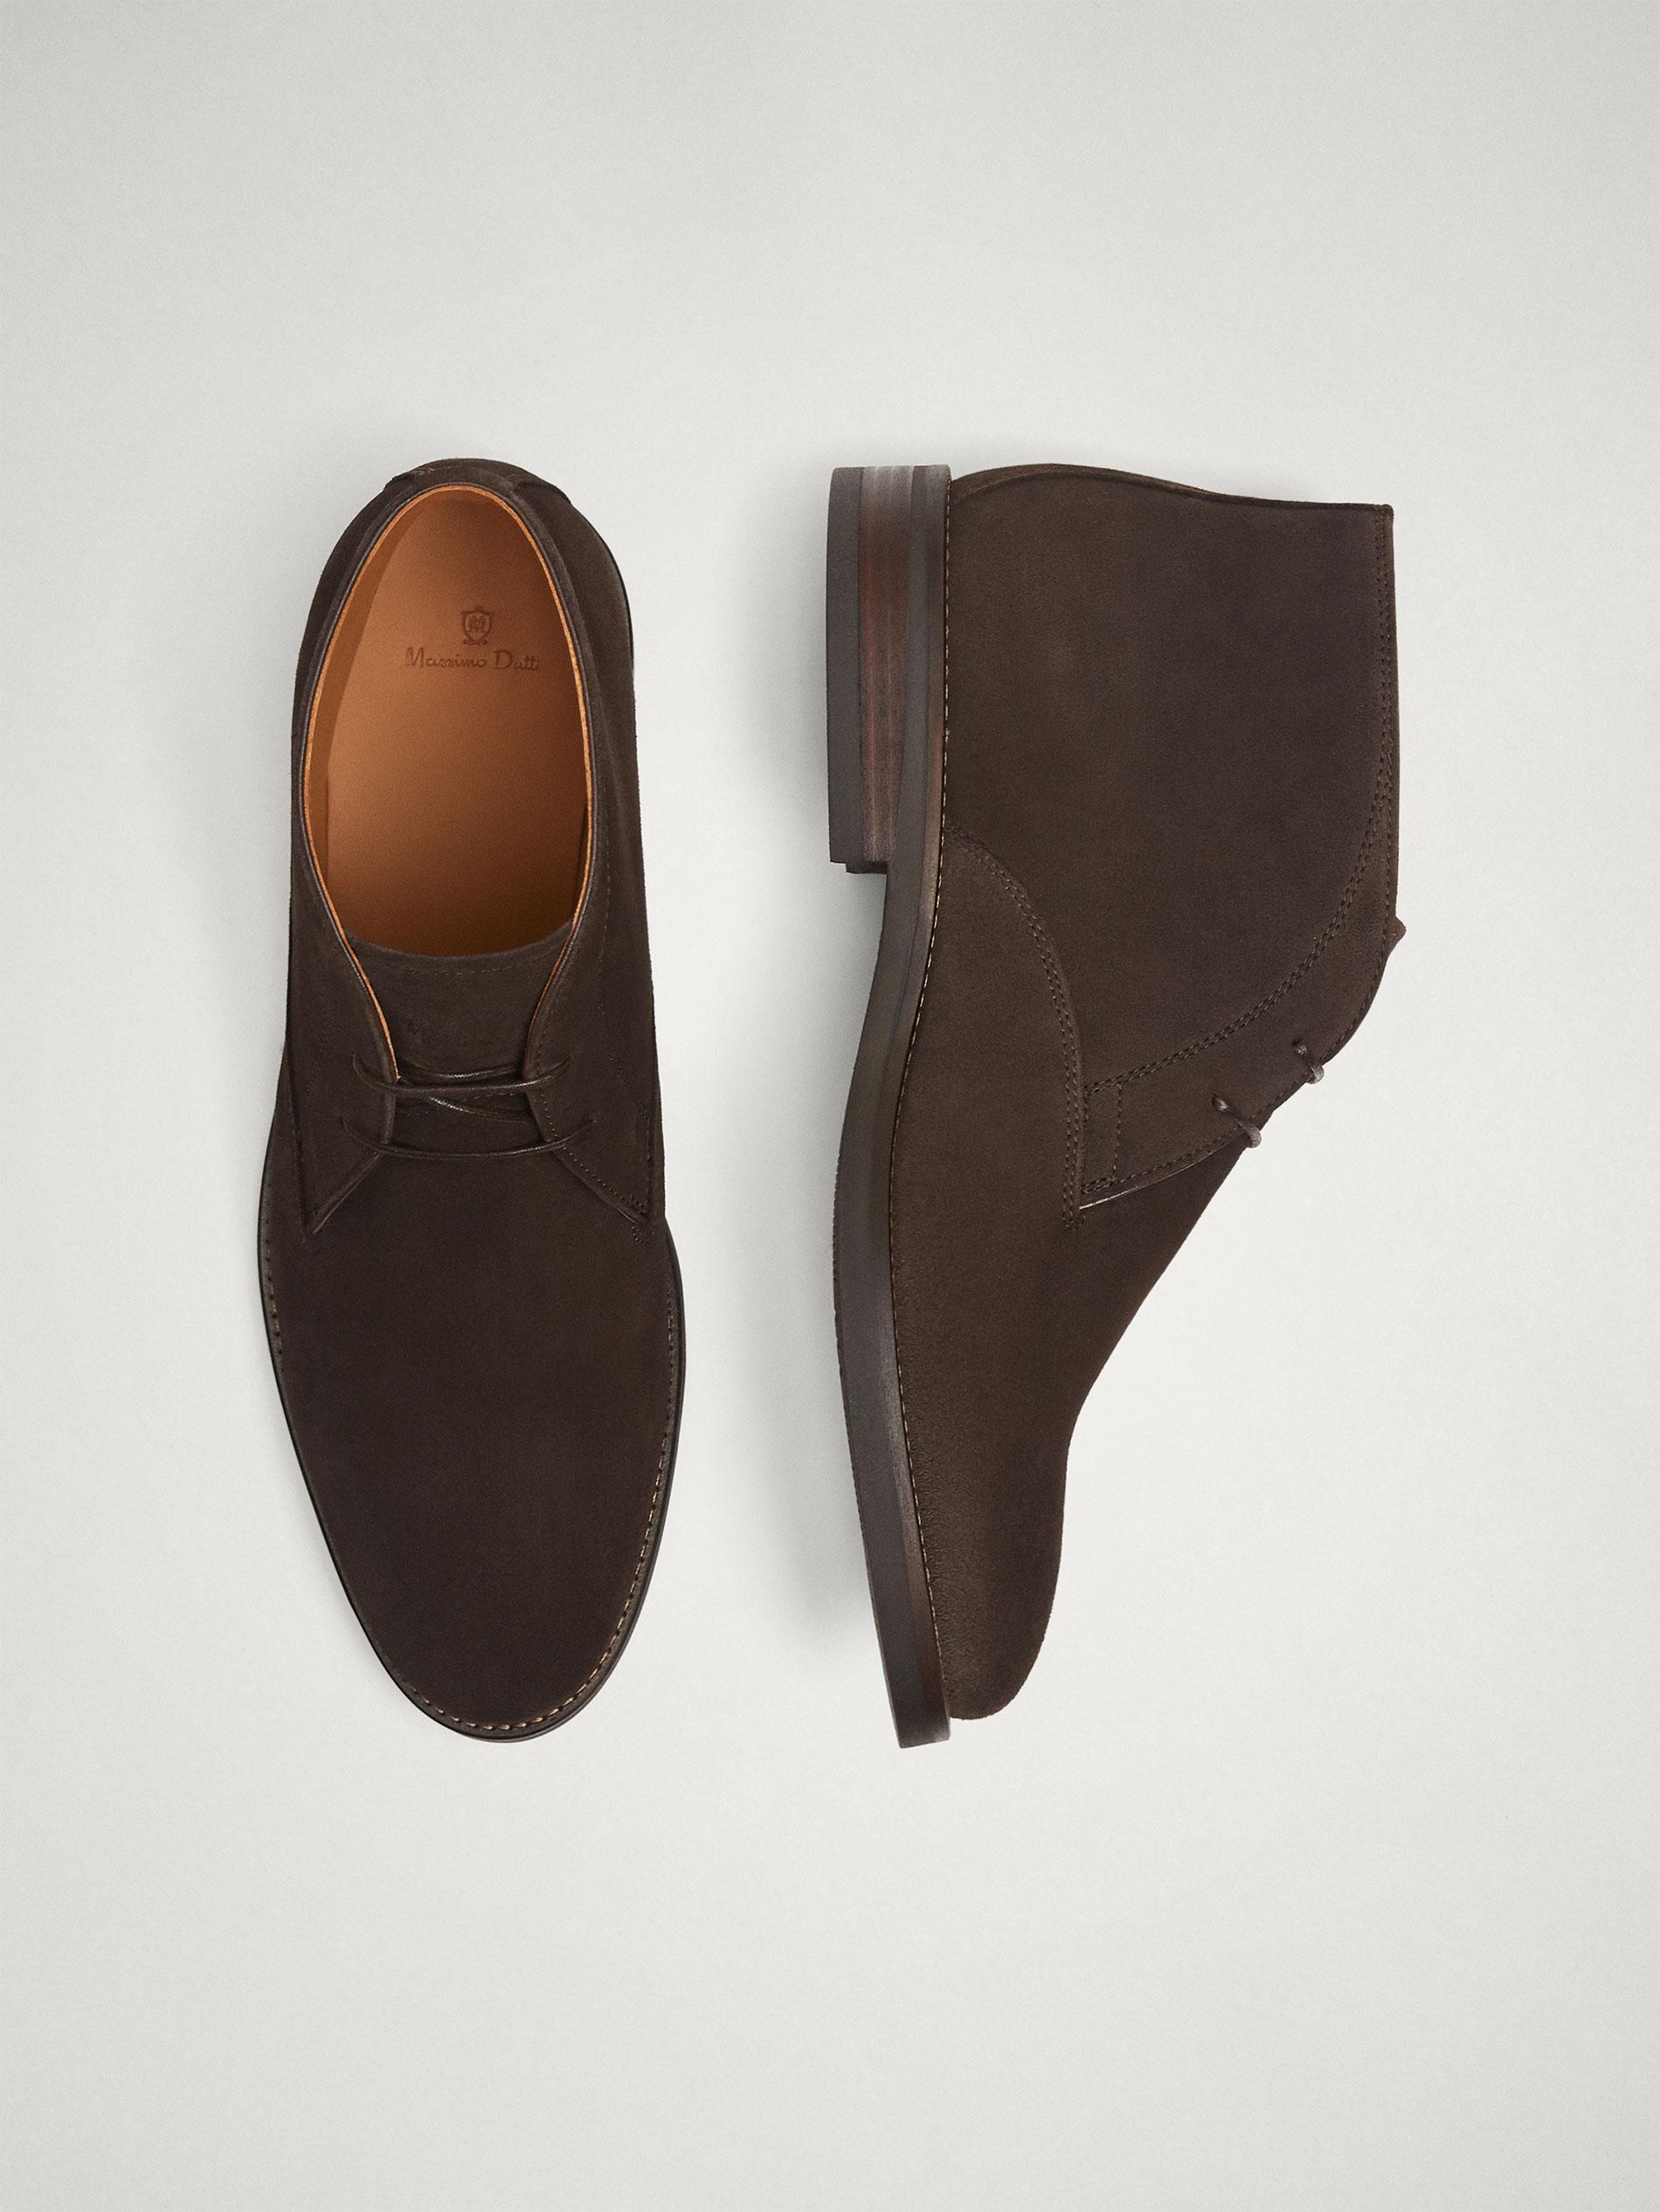 Hombre Massimo Y Botas Colección Dutti Zapatos Botines AHAqZ4